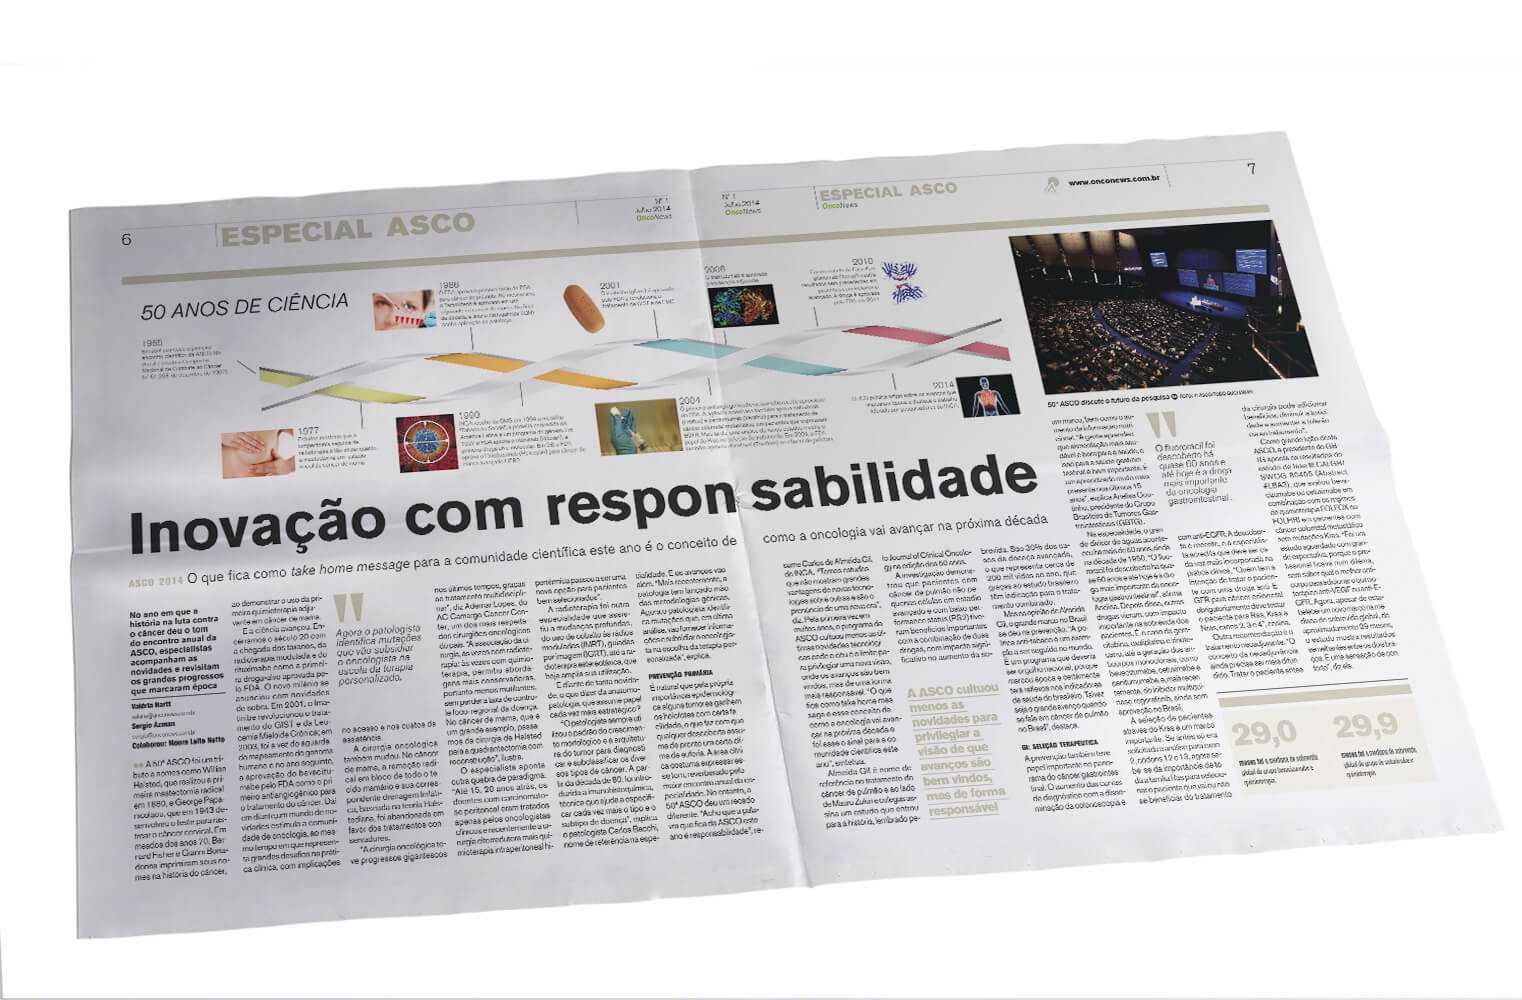 onconews-newspaper_spread-4